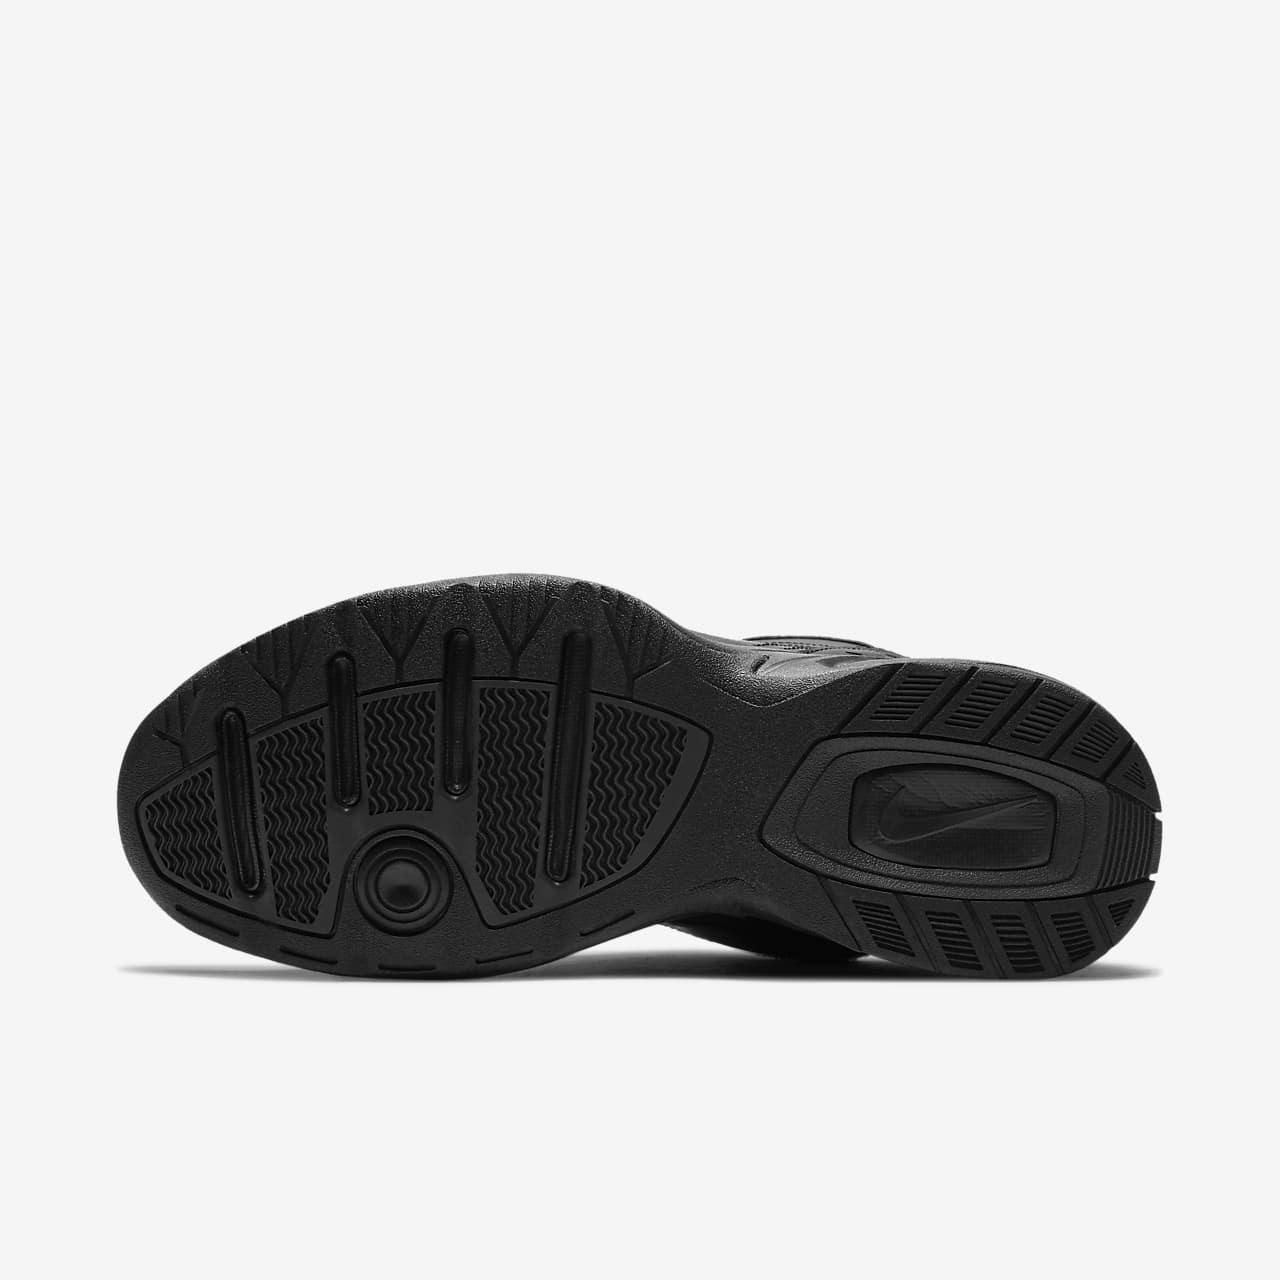 Nike Air Monarch IV Schuh für LifestyleFitnessstudio. Nike LU